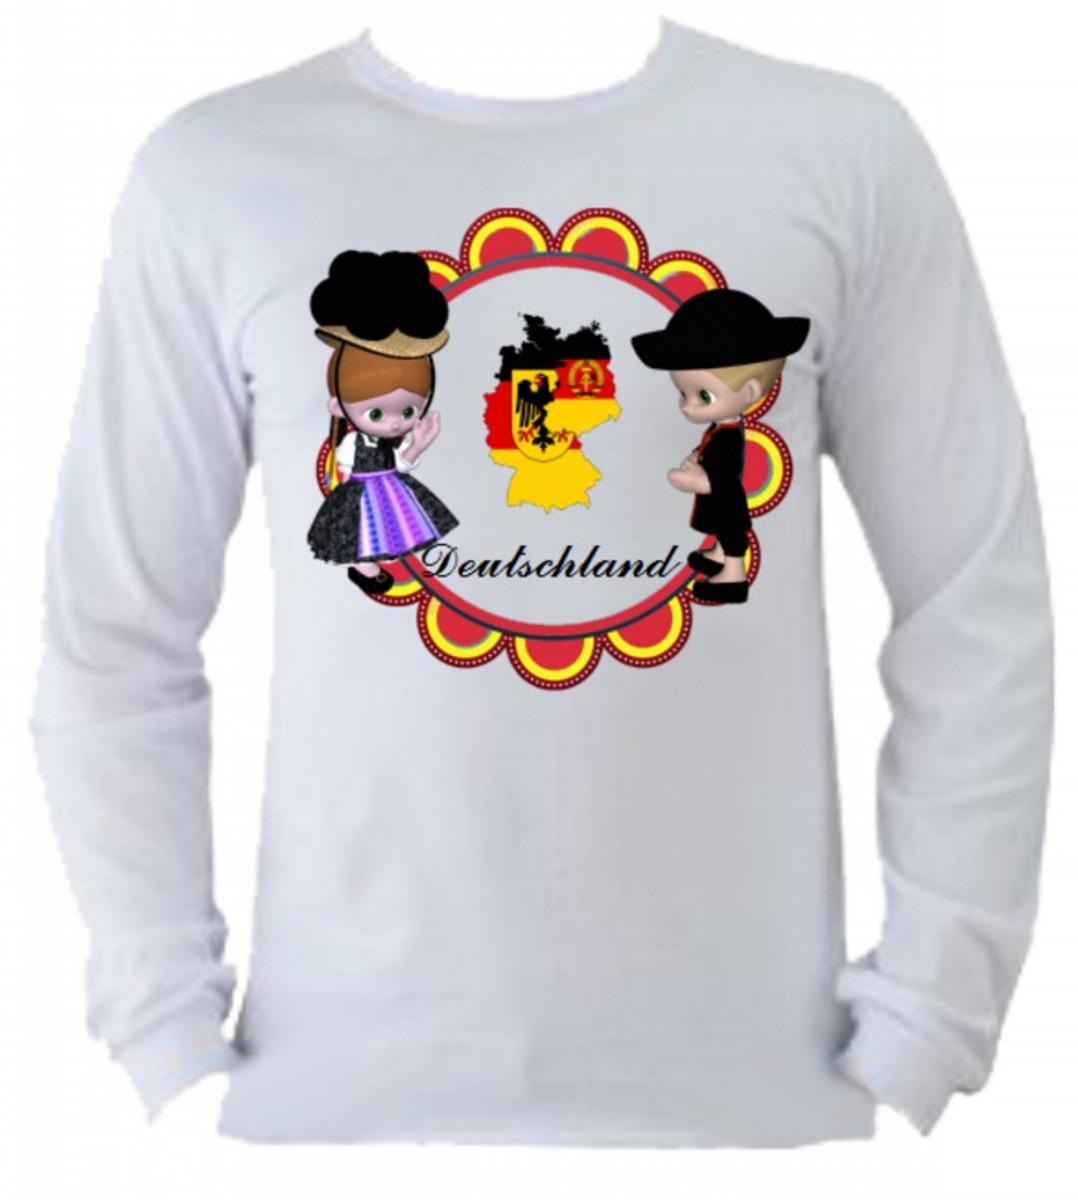 Camiseta Alemanha manga longa 1 no Elo7  77d0b31b82350